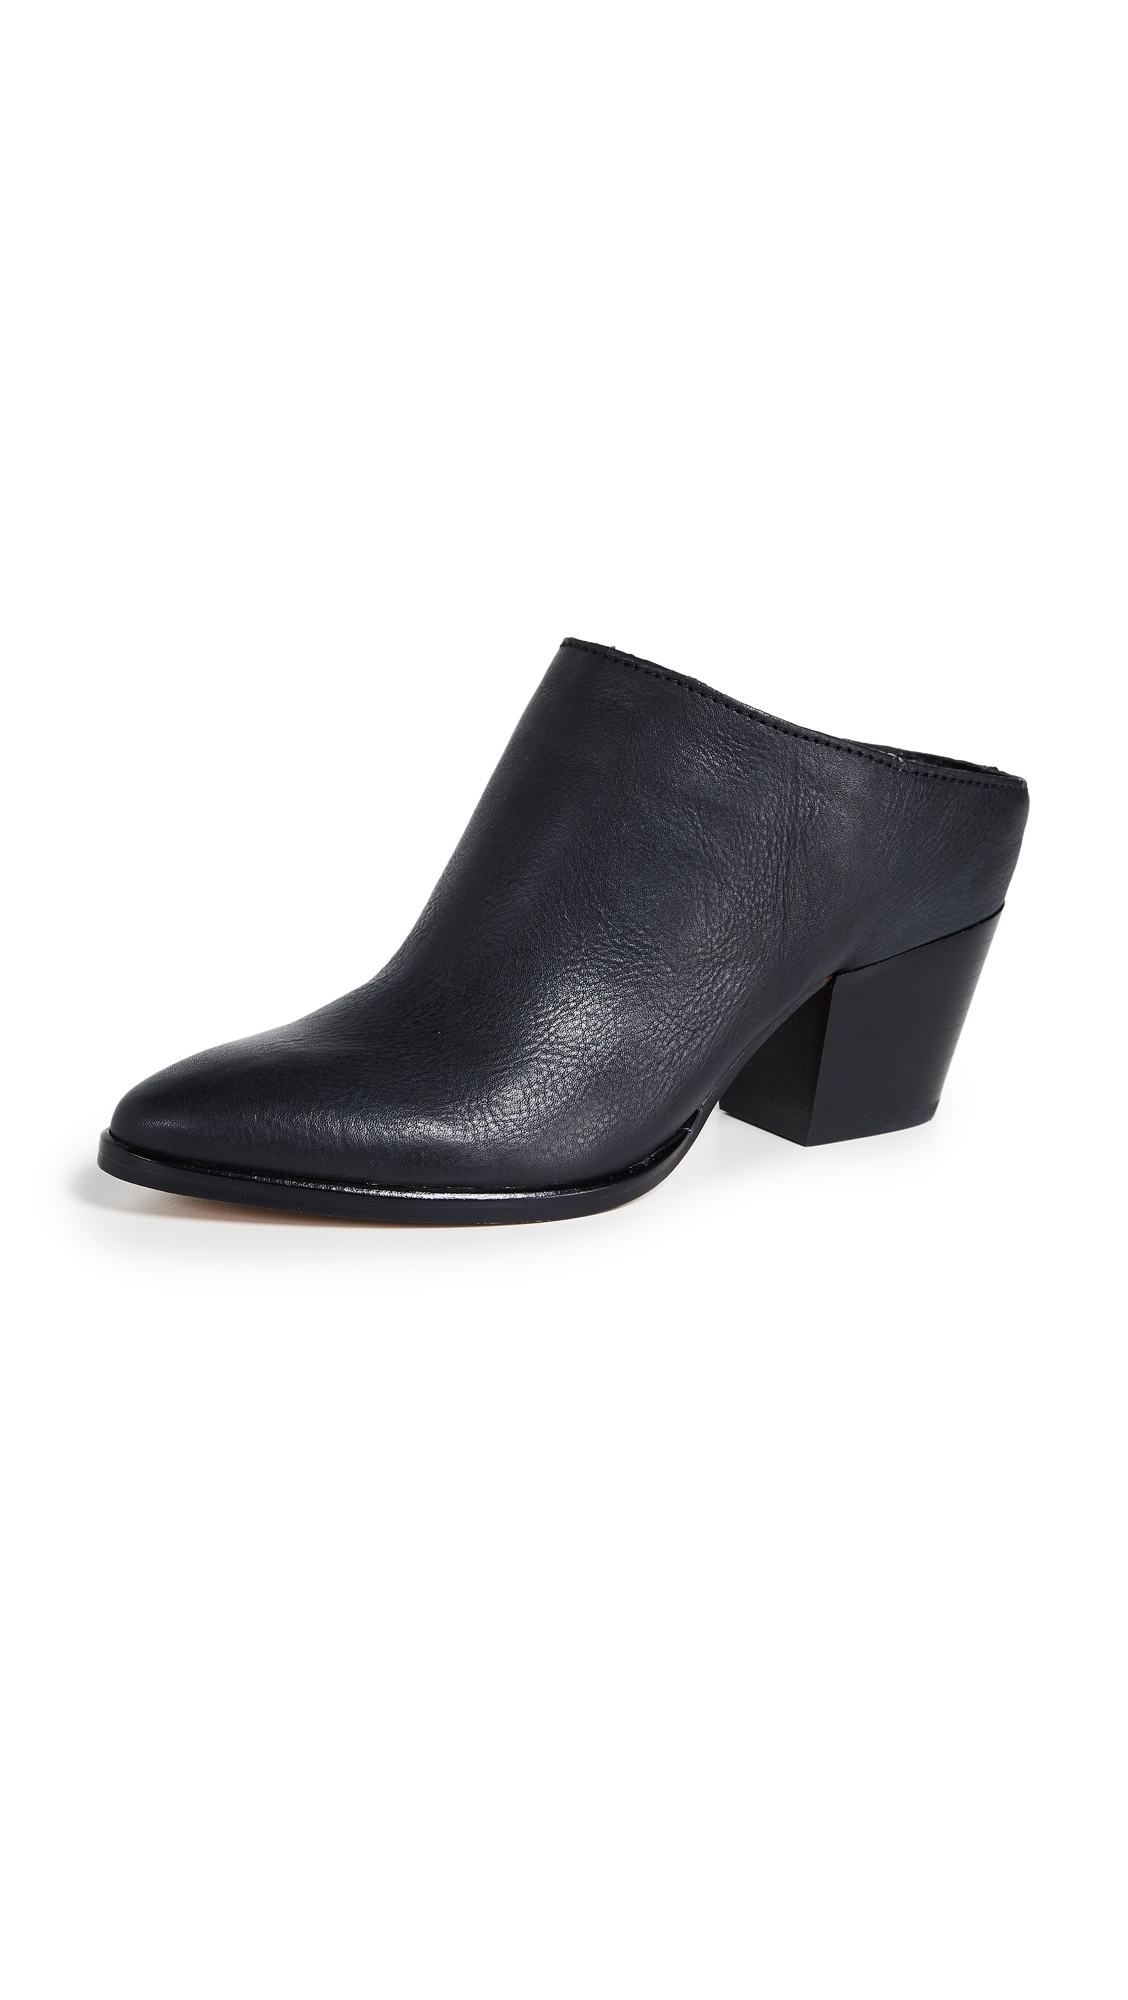 Dolce Vita Roya Block Heel Mules - Black